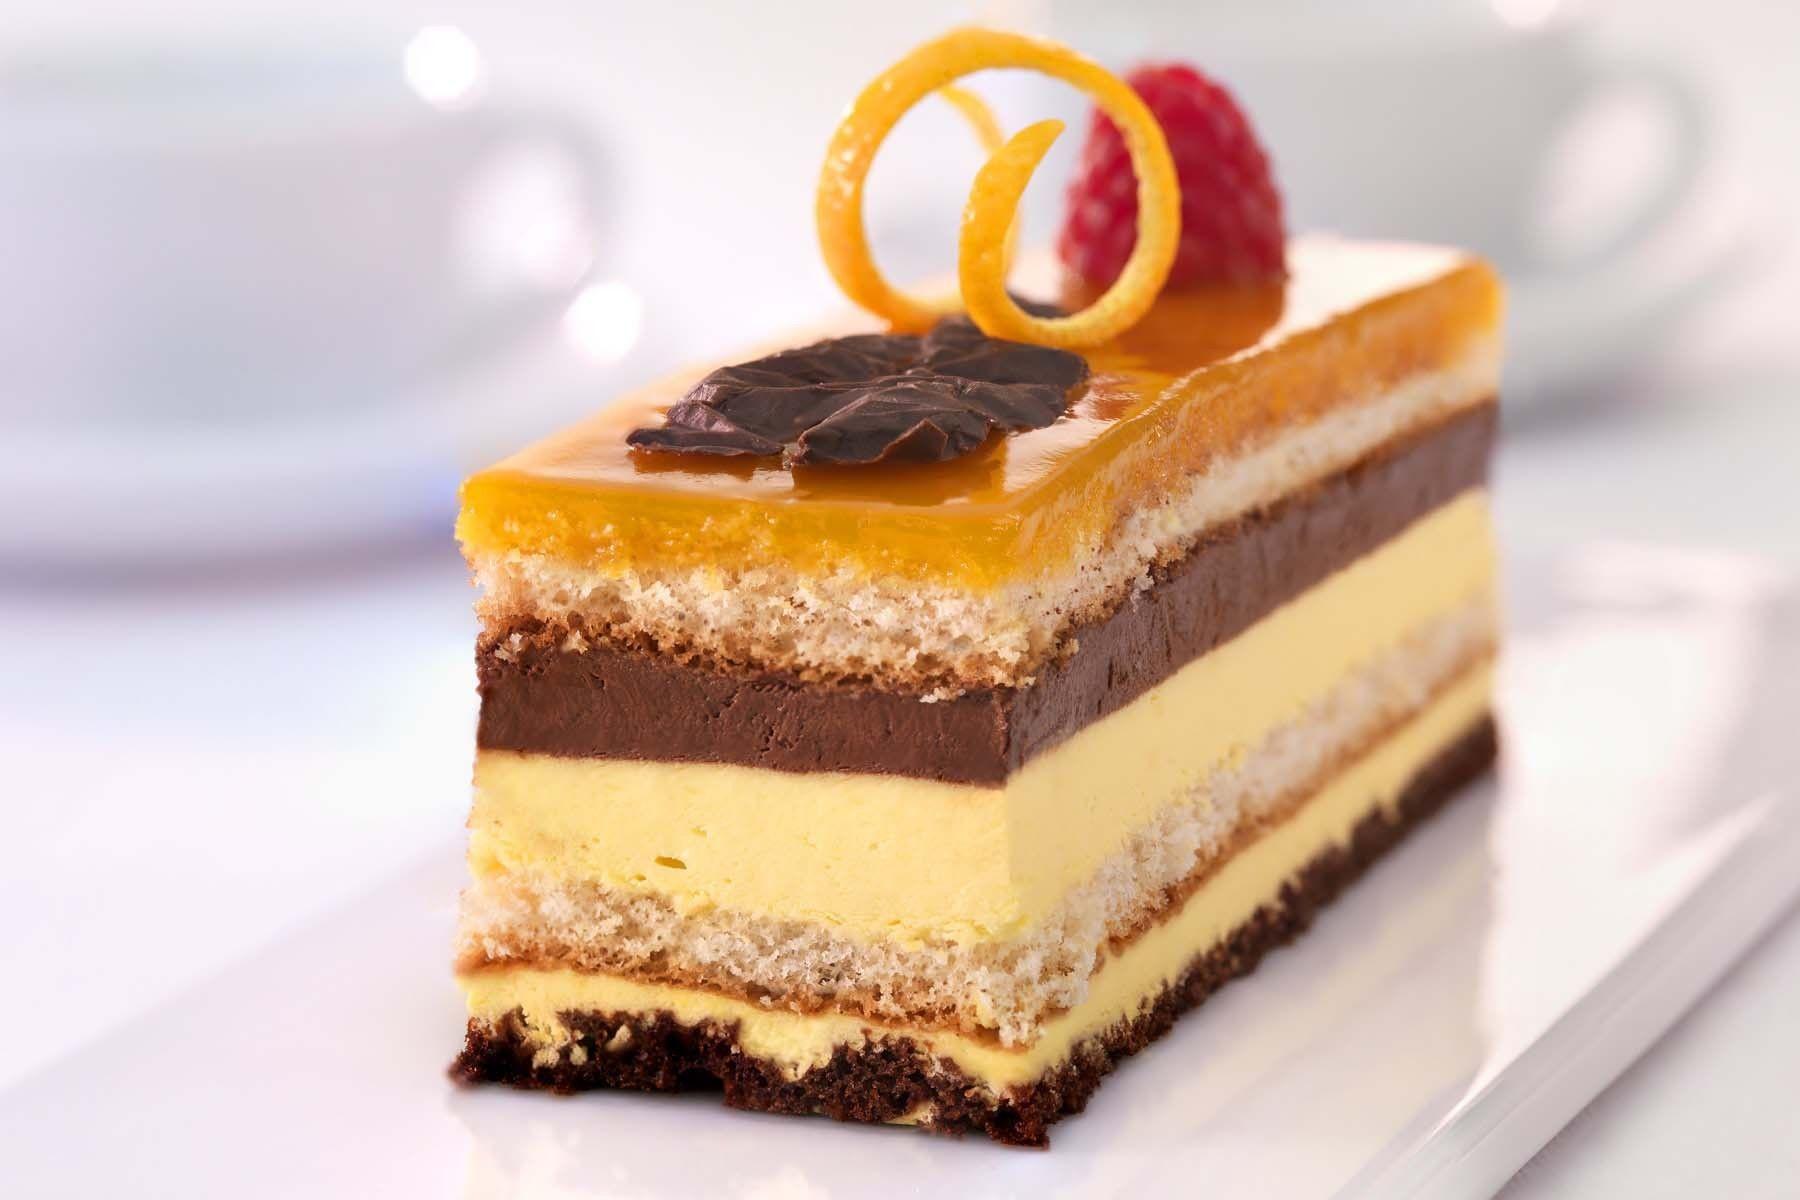 Chocolate & Orange Dessert.